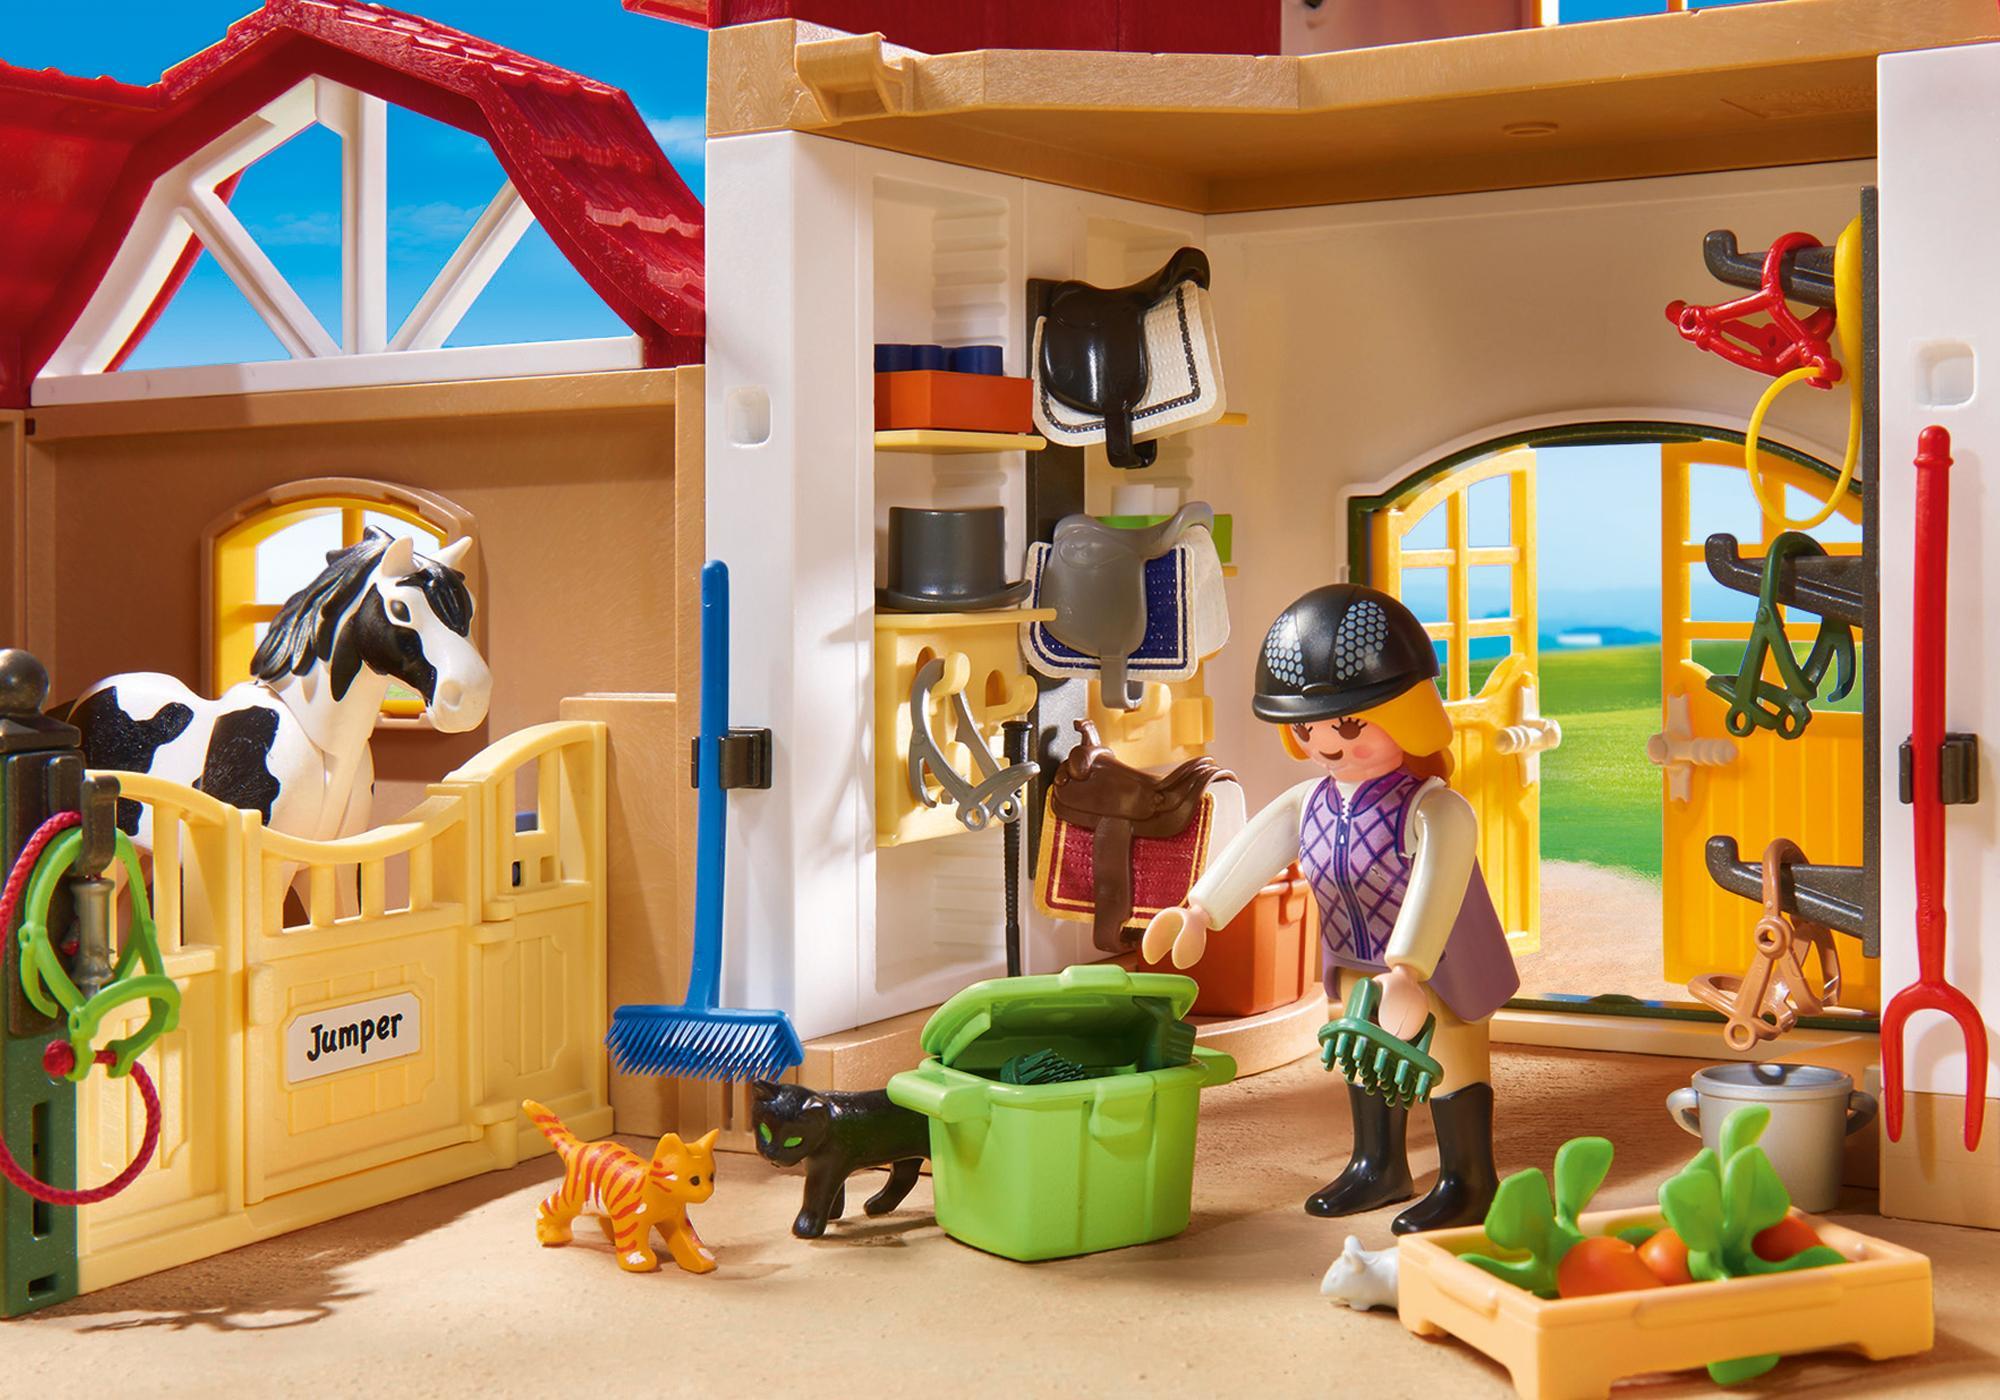 http://media.playmobil.com/i/playmobil/6926_product_extra3